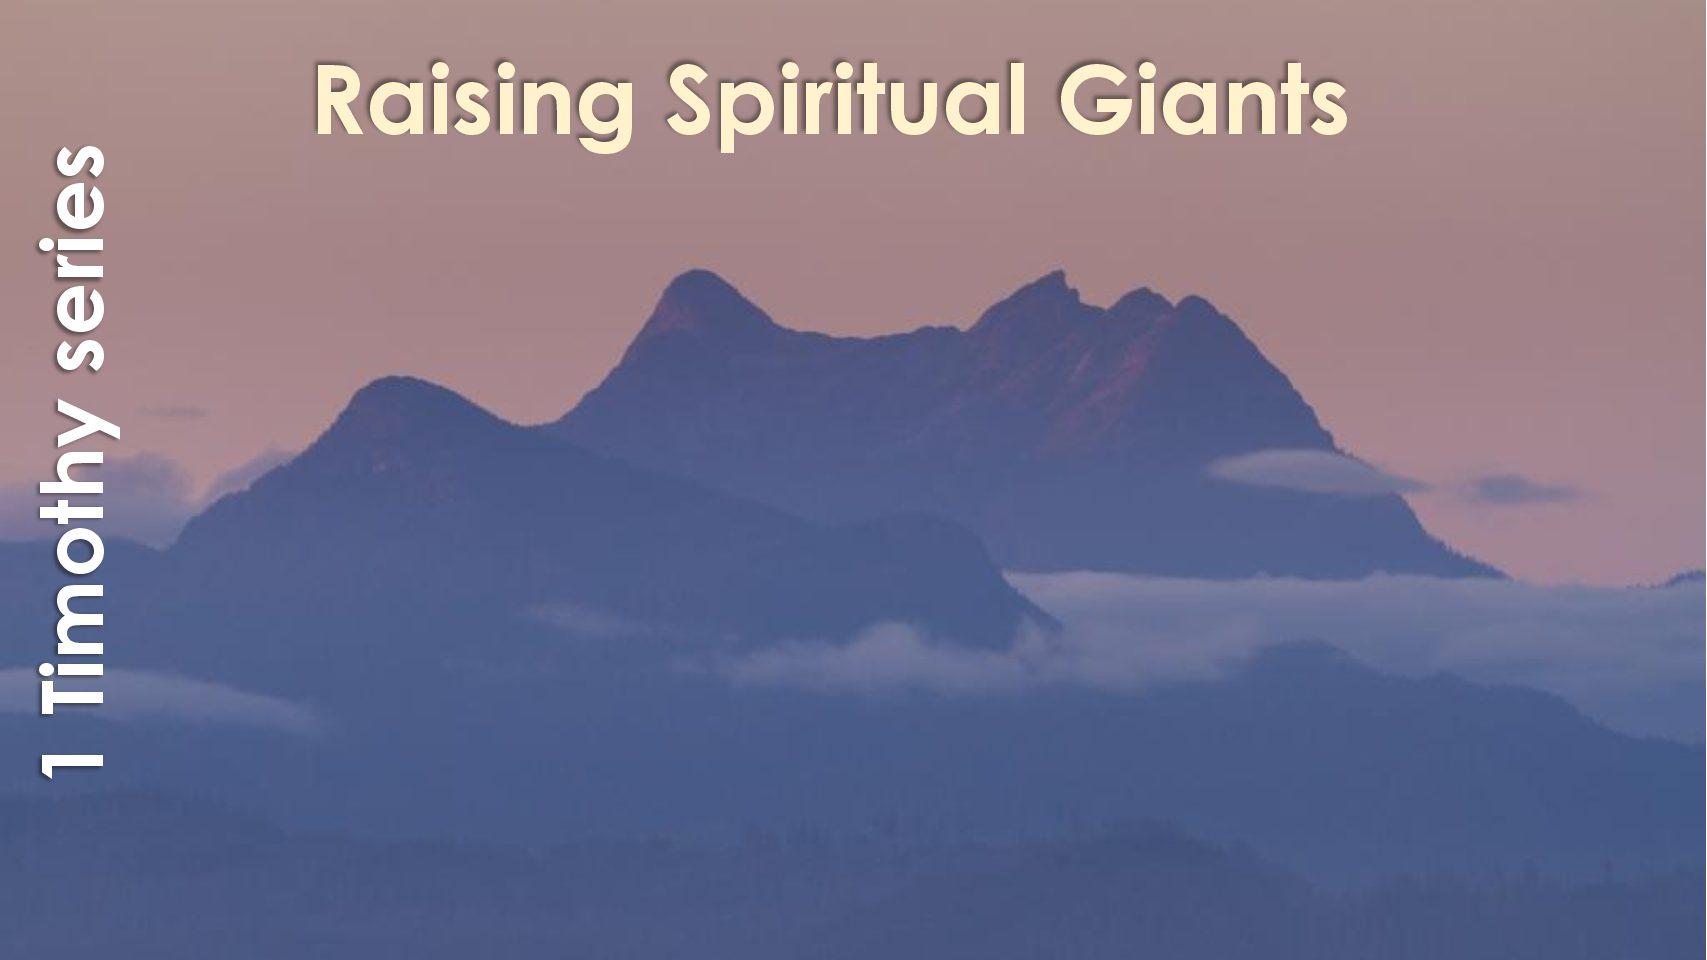 Raising Spiritual Giants 1 Timothy 1